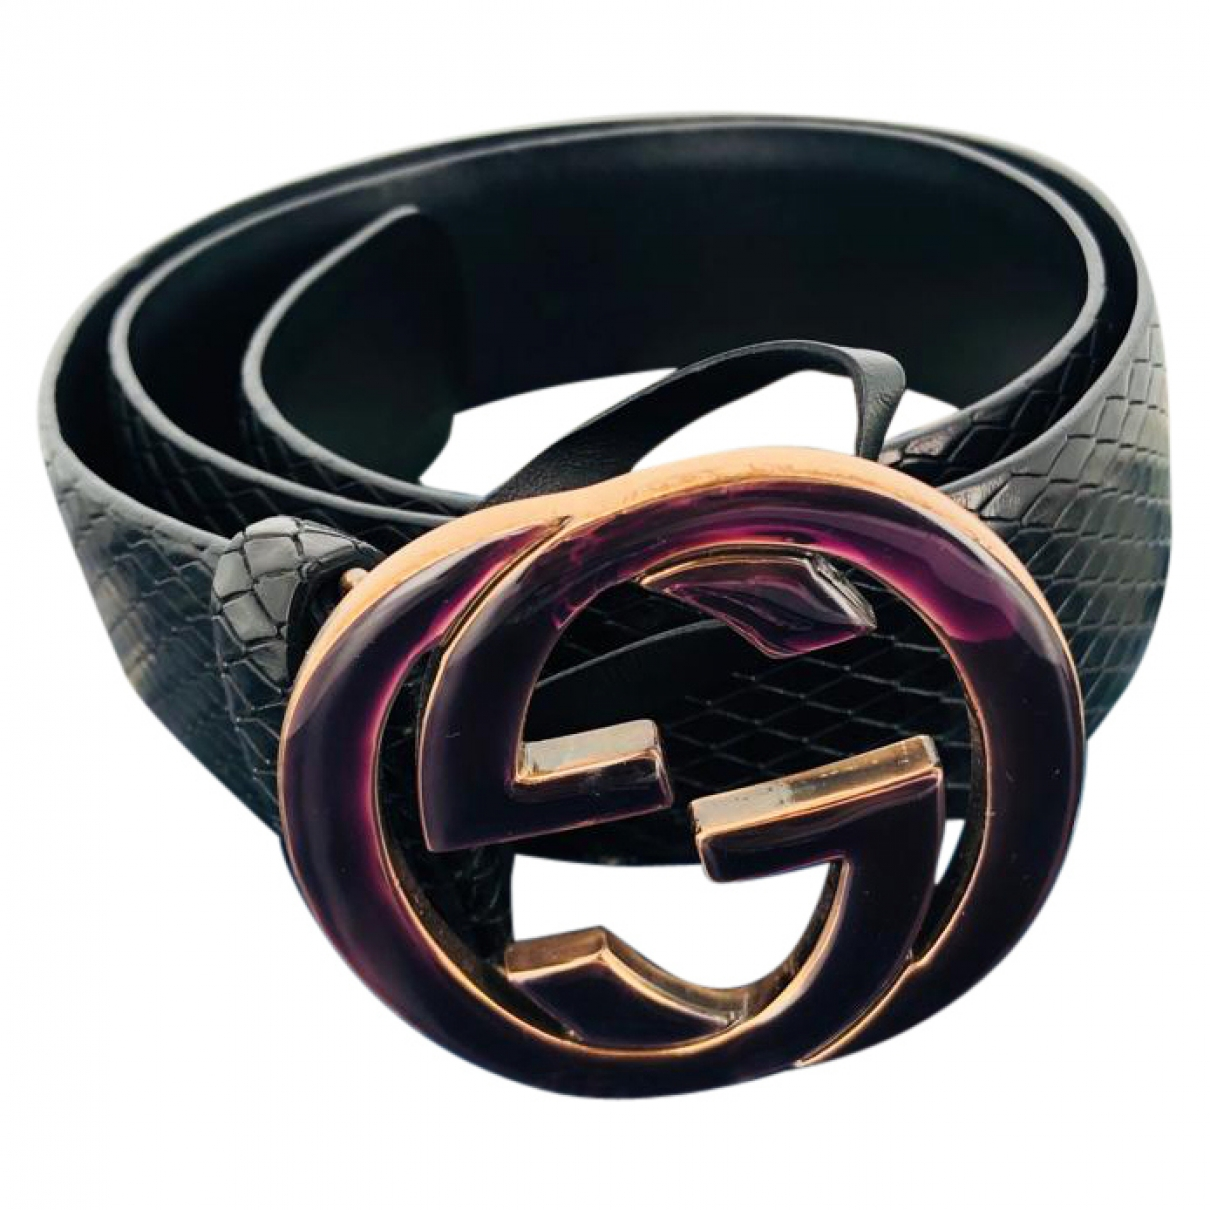 Gucci Interlocking Buckle Black Leather belt for Women 90 cm